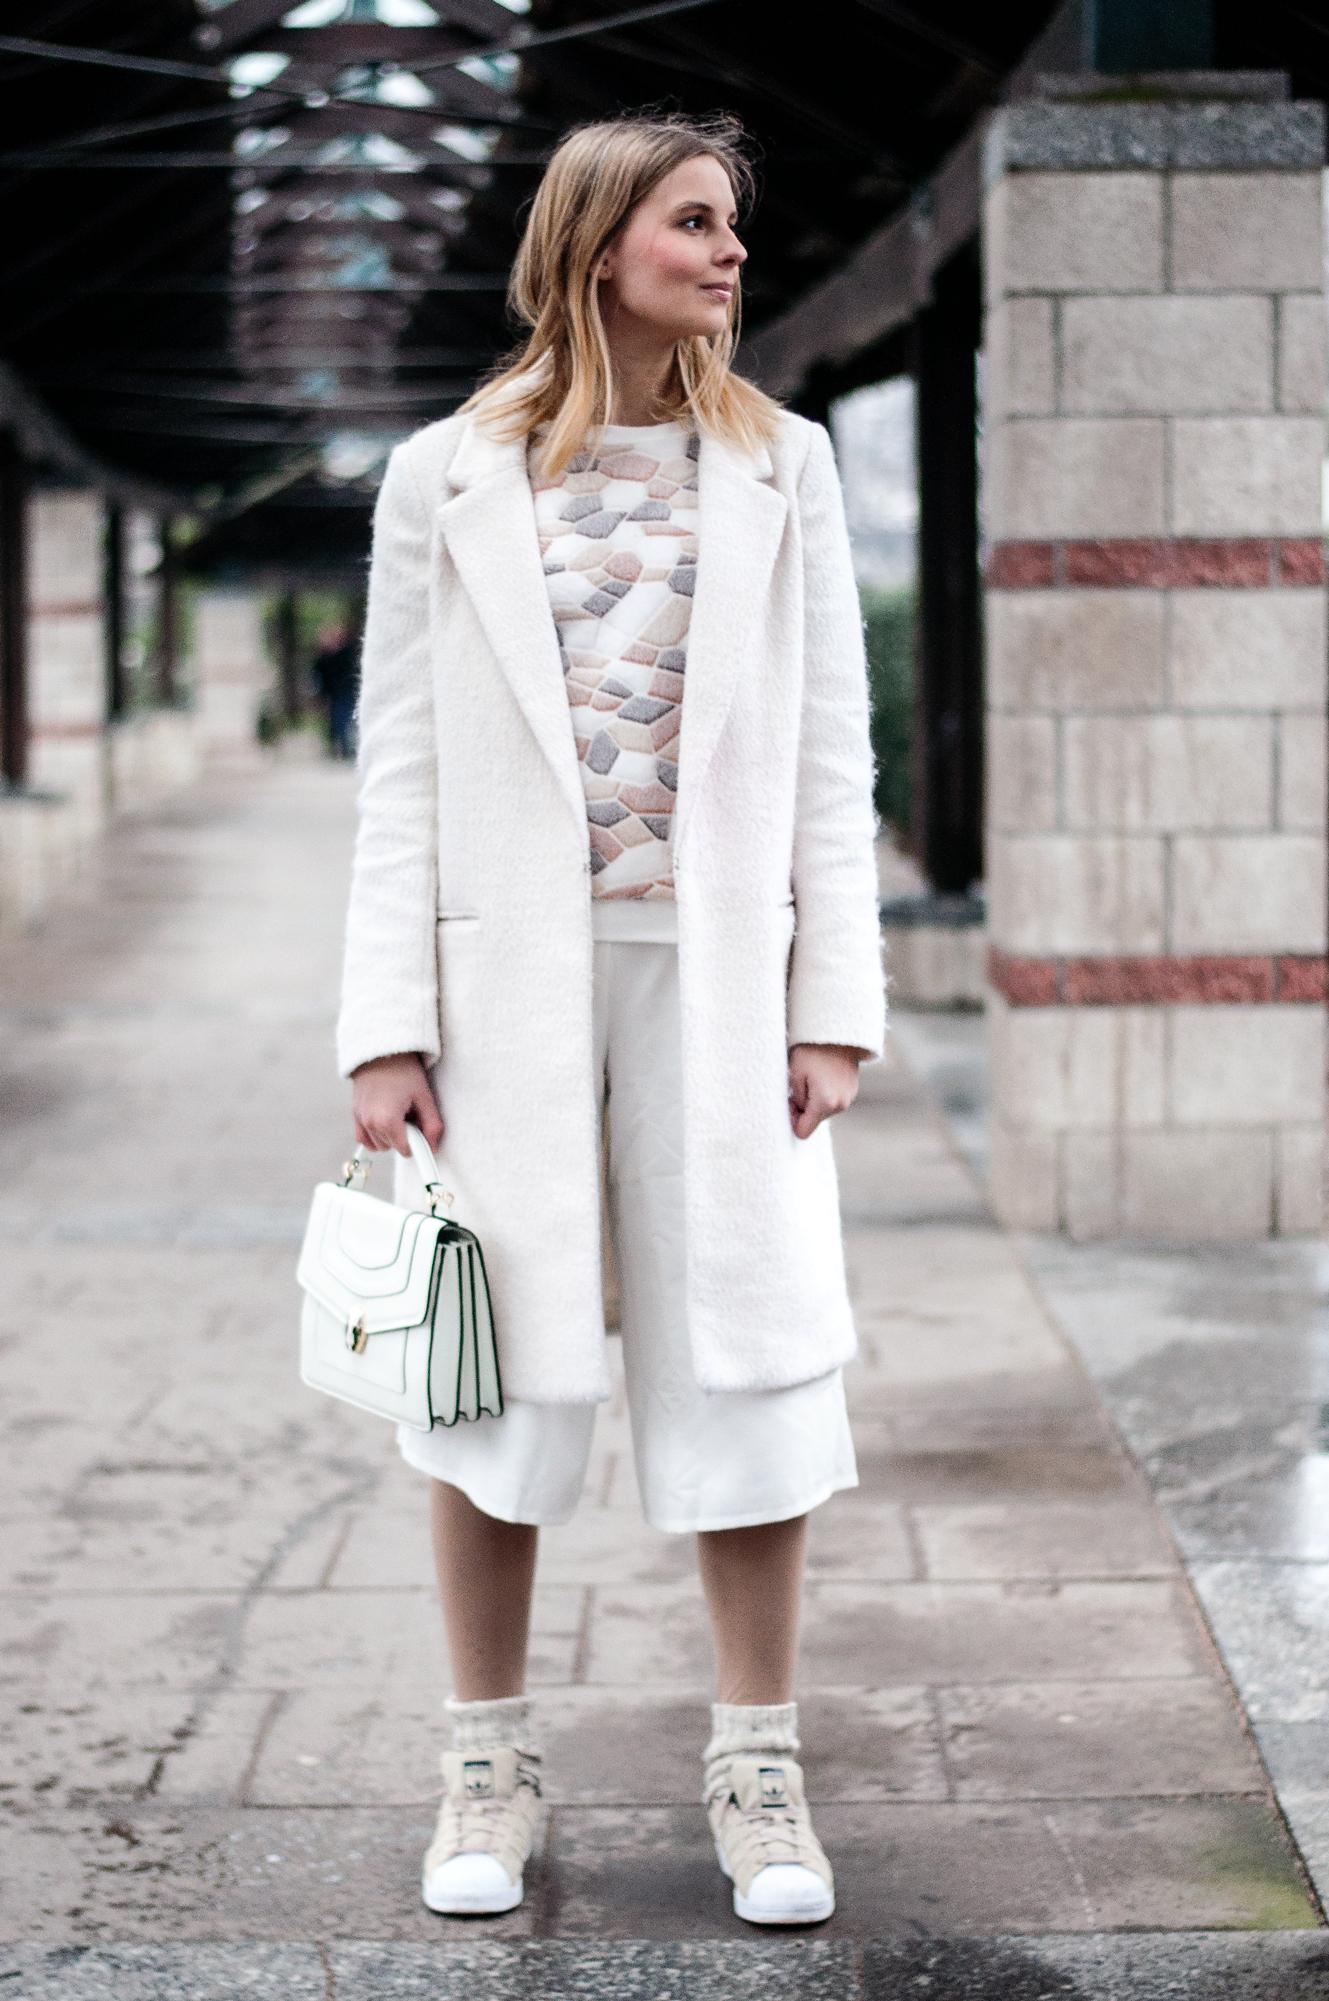 OUTFIT | Die weiße Culotte